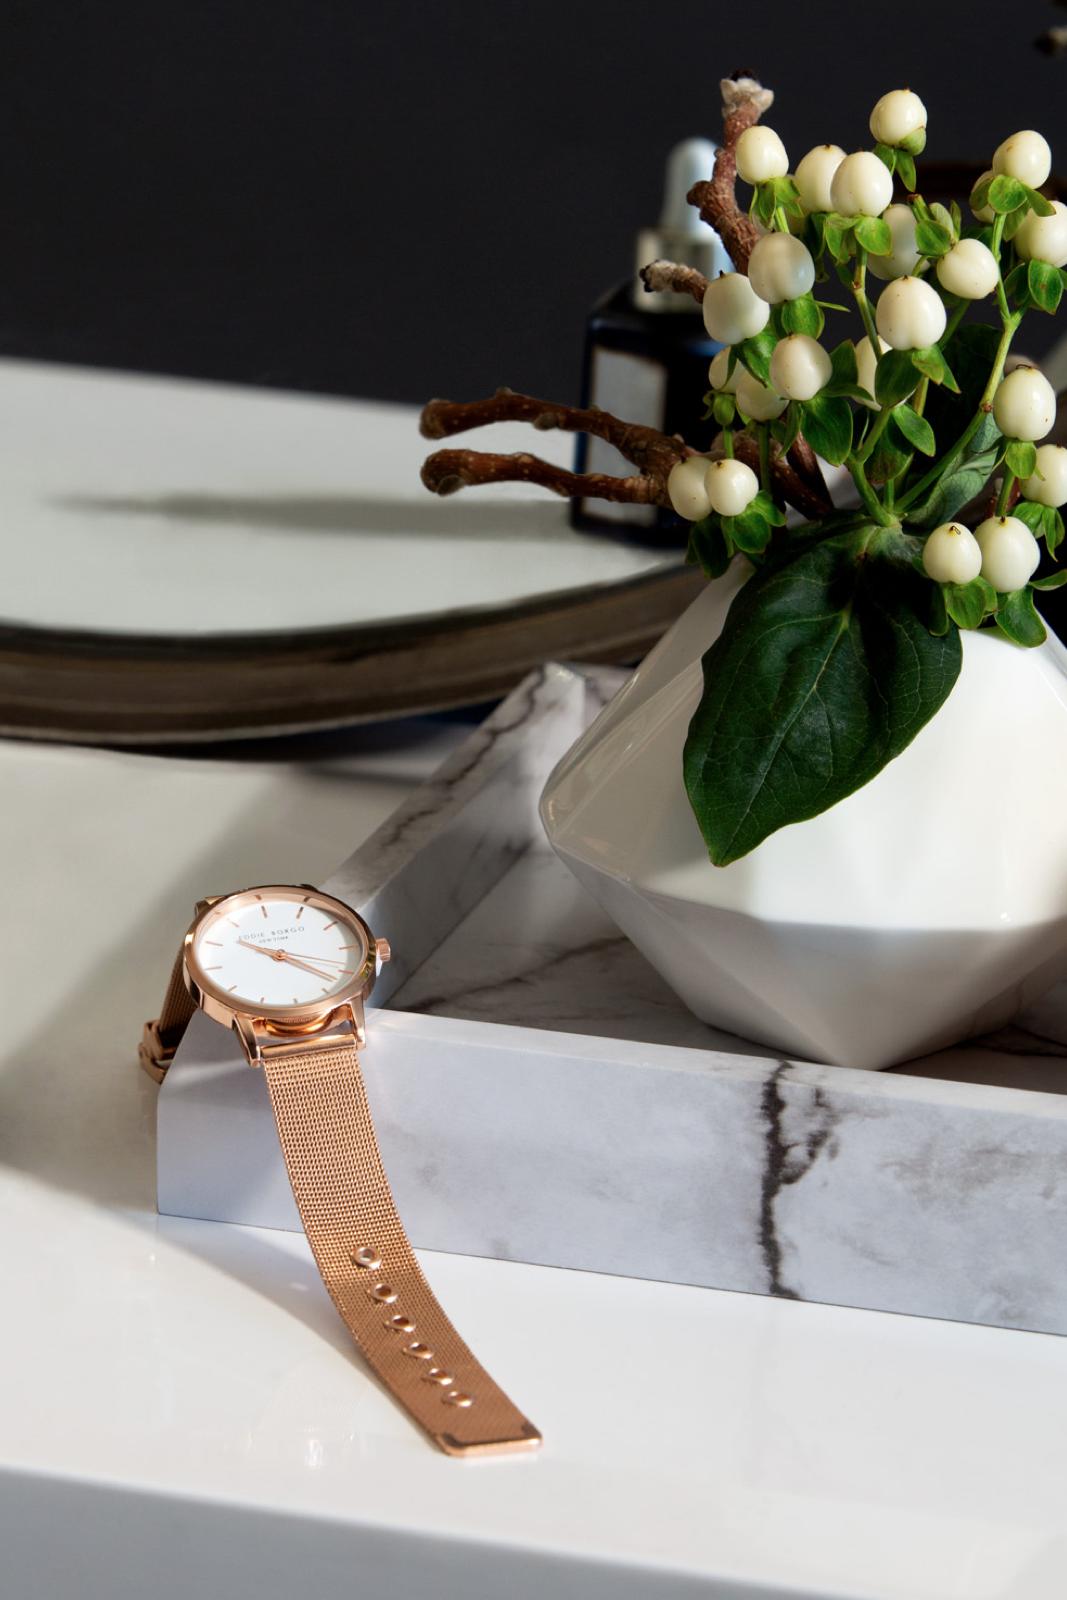 chic fashion - Eddie Borgo The Soho Watch